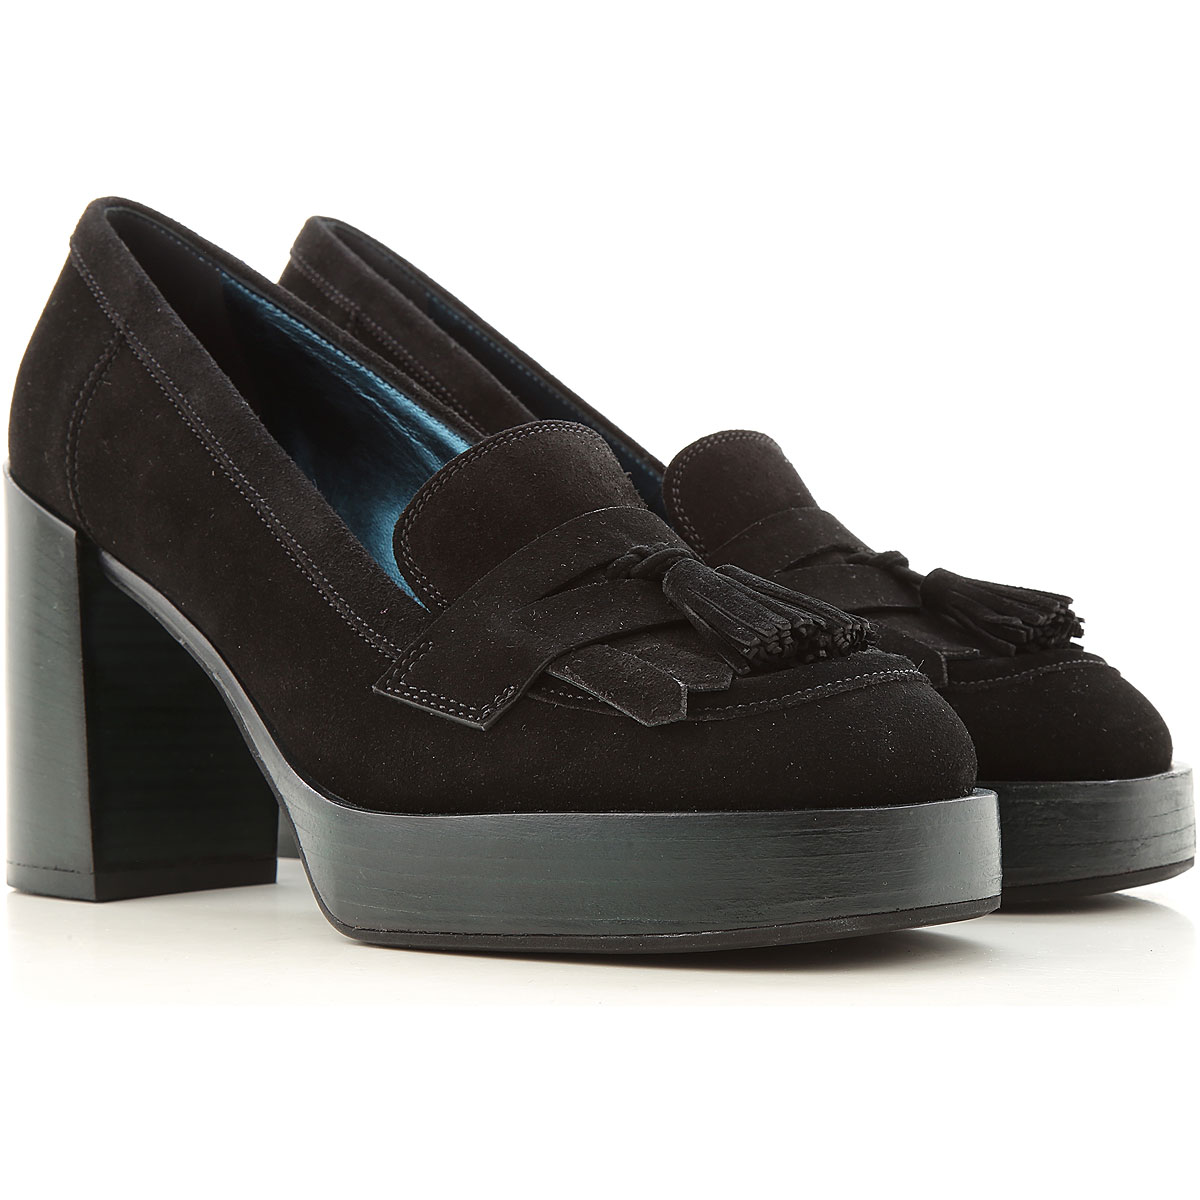 Lella Baldi Pumps & High Heels for Women On Sale, Black, Suede leather, 2019, 6 7 8